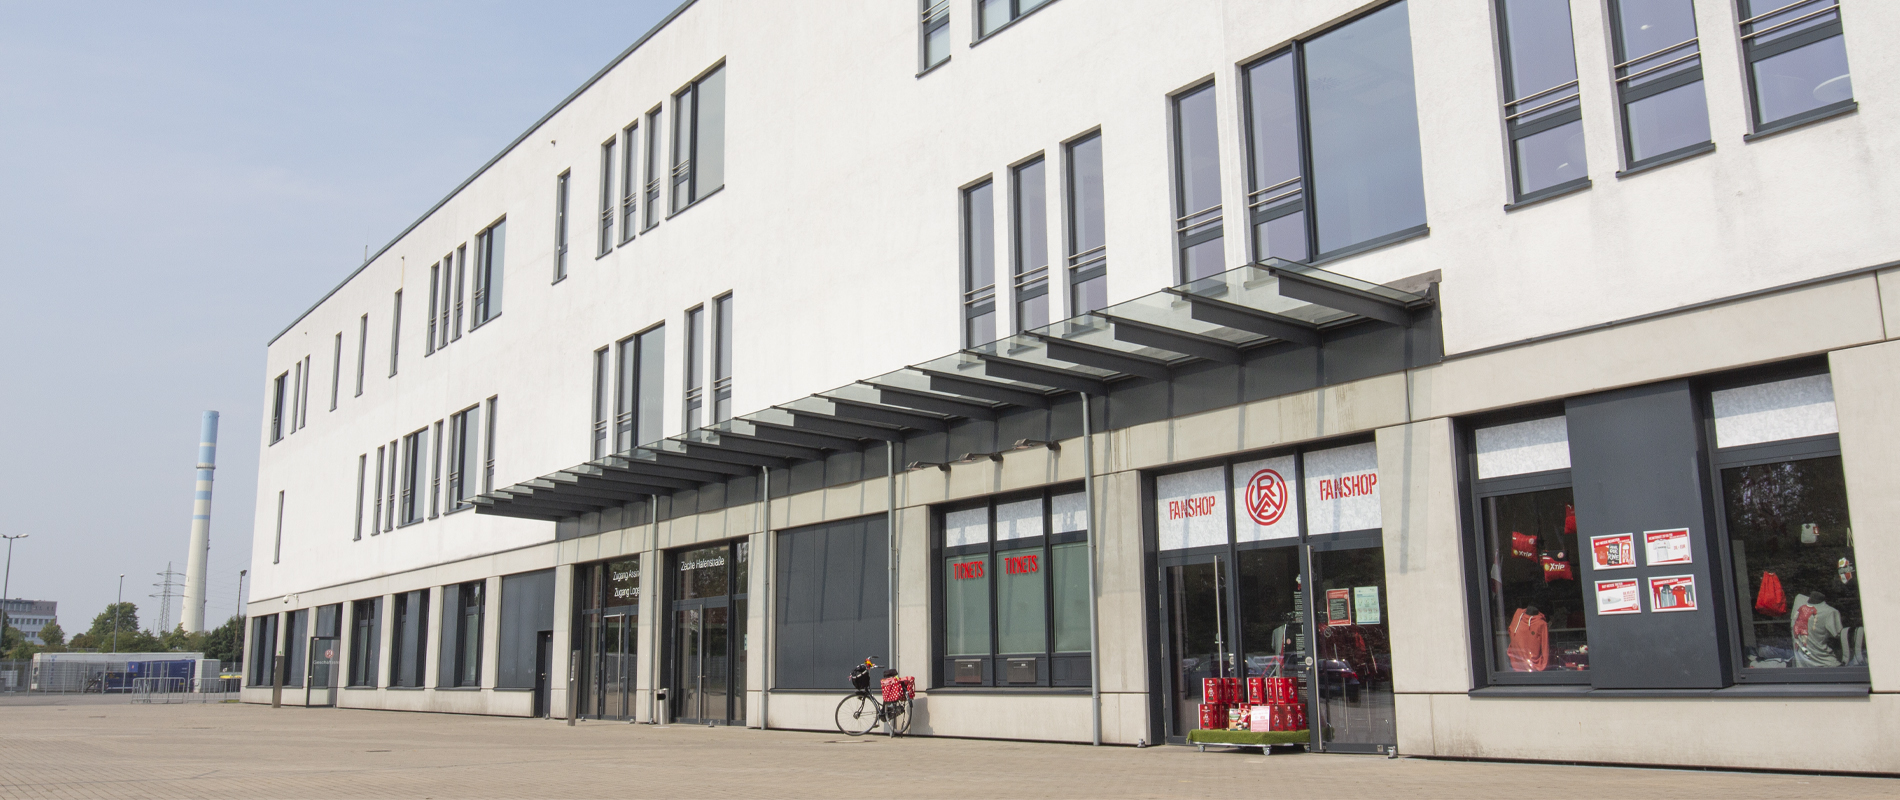 Geschäftsstelle und Fanshop an der Hafenstraße Mittwoch geschlossen – Rot-Weiss Essen